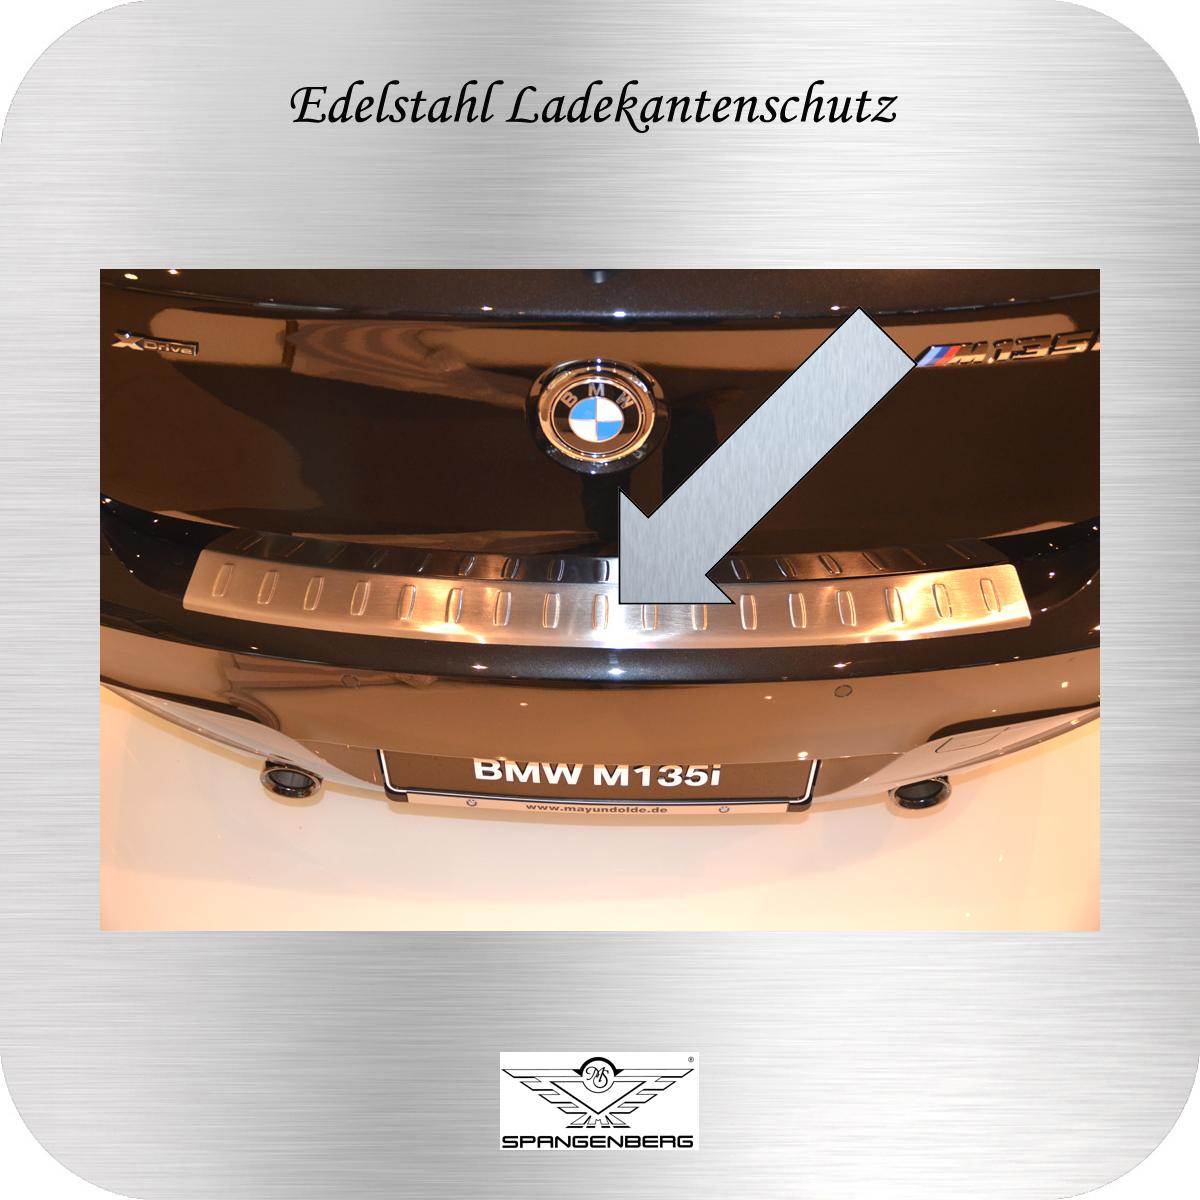 Ladekantenschutz Edelstahl BMW 1er F20 5-Türer 2010- 3235741